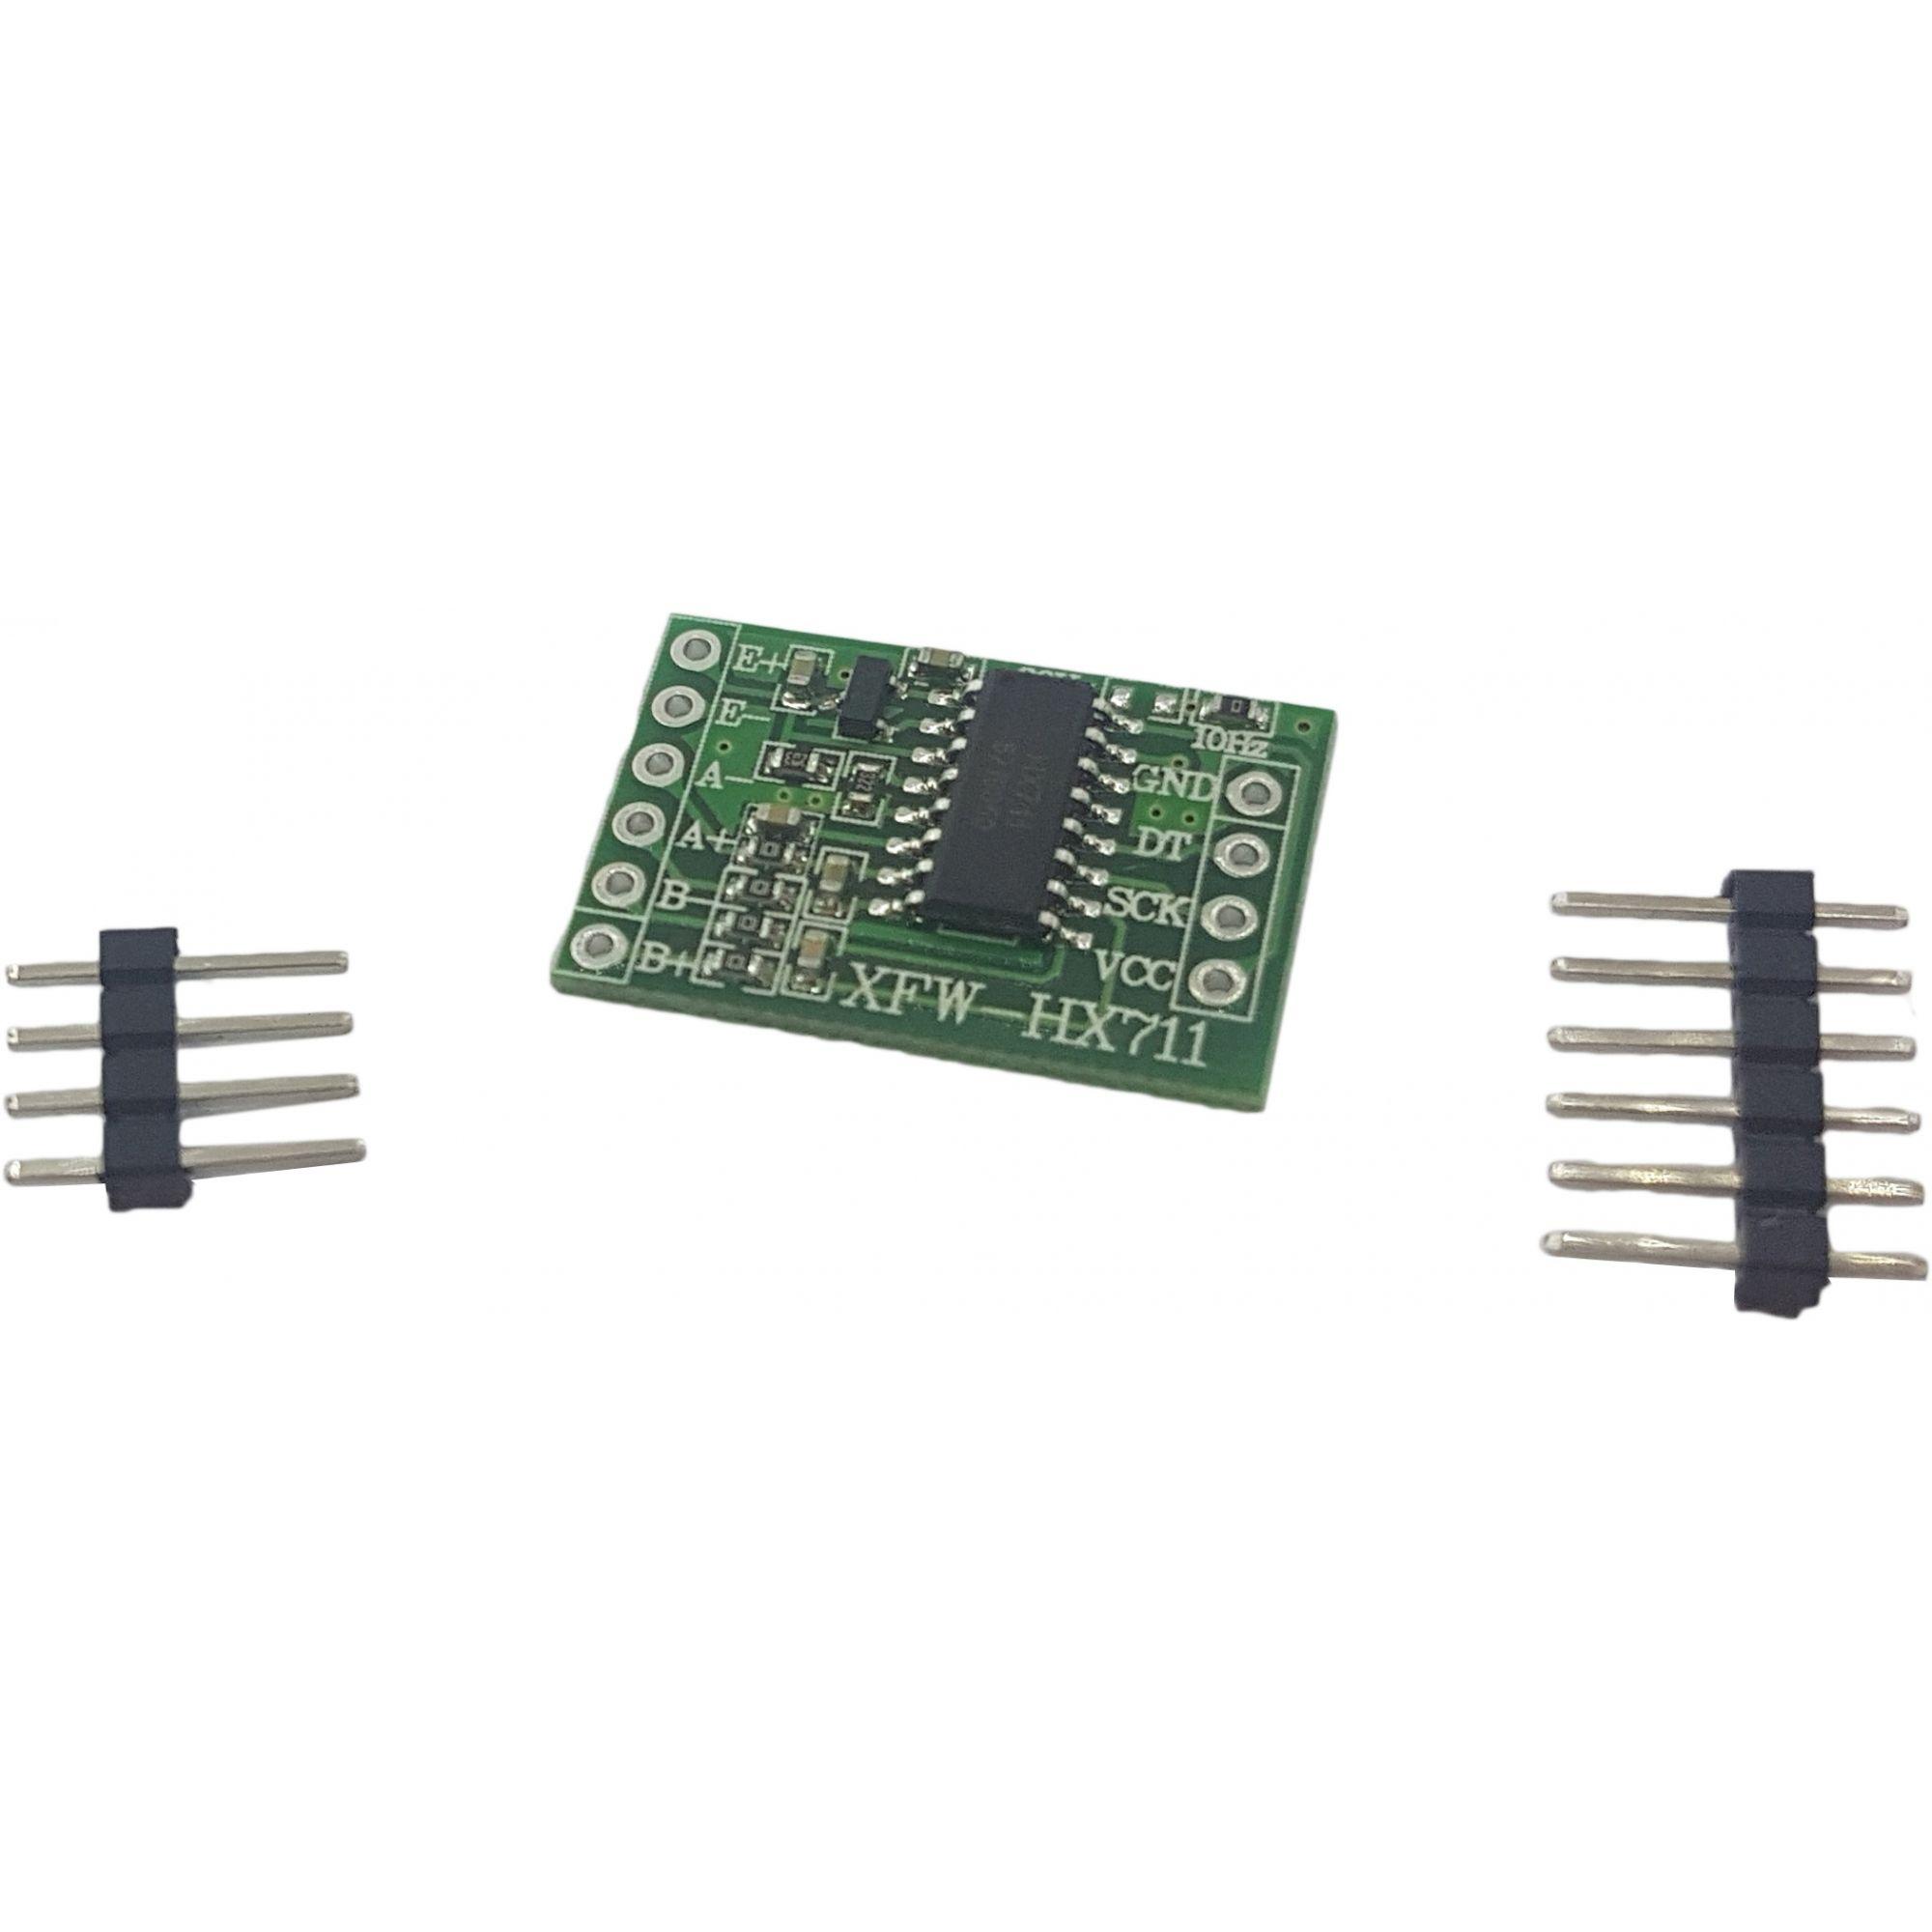 módulo hx711 para célula carga